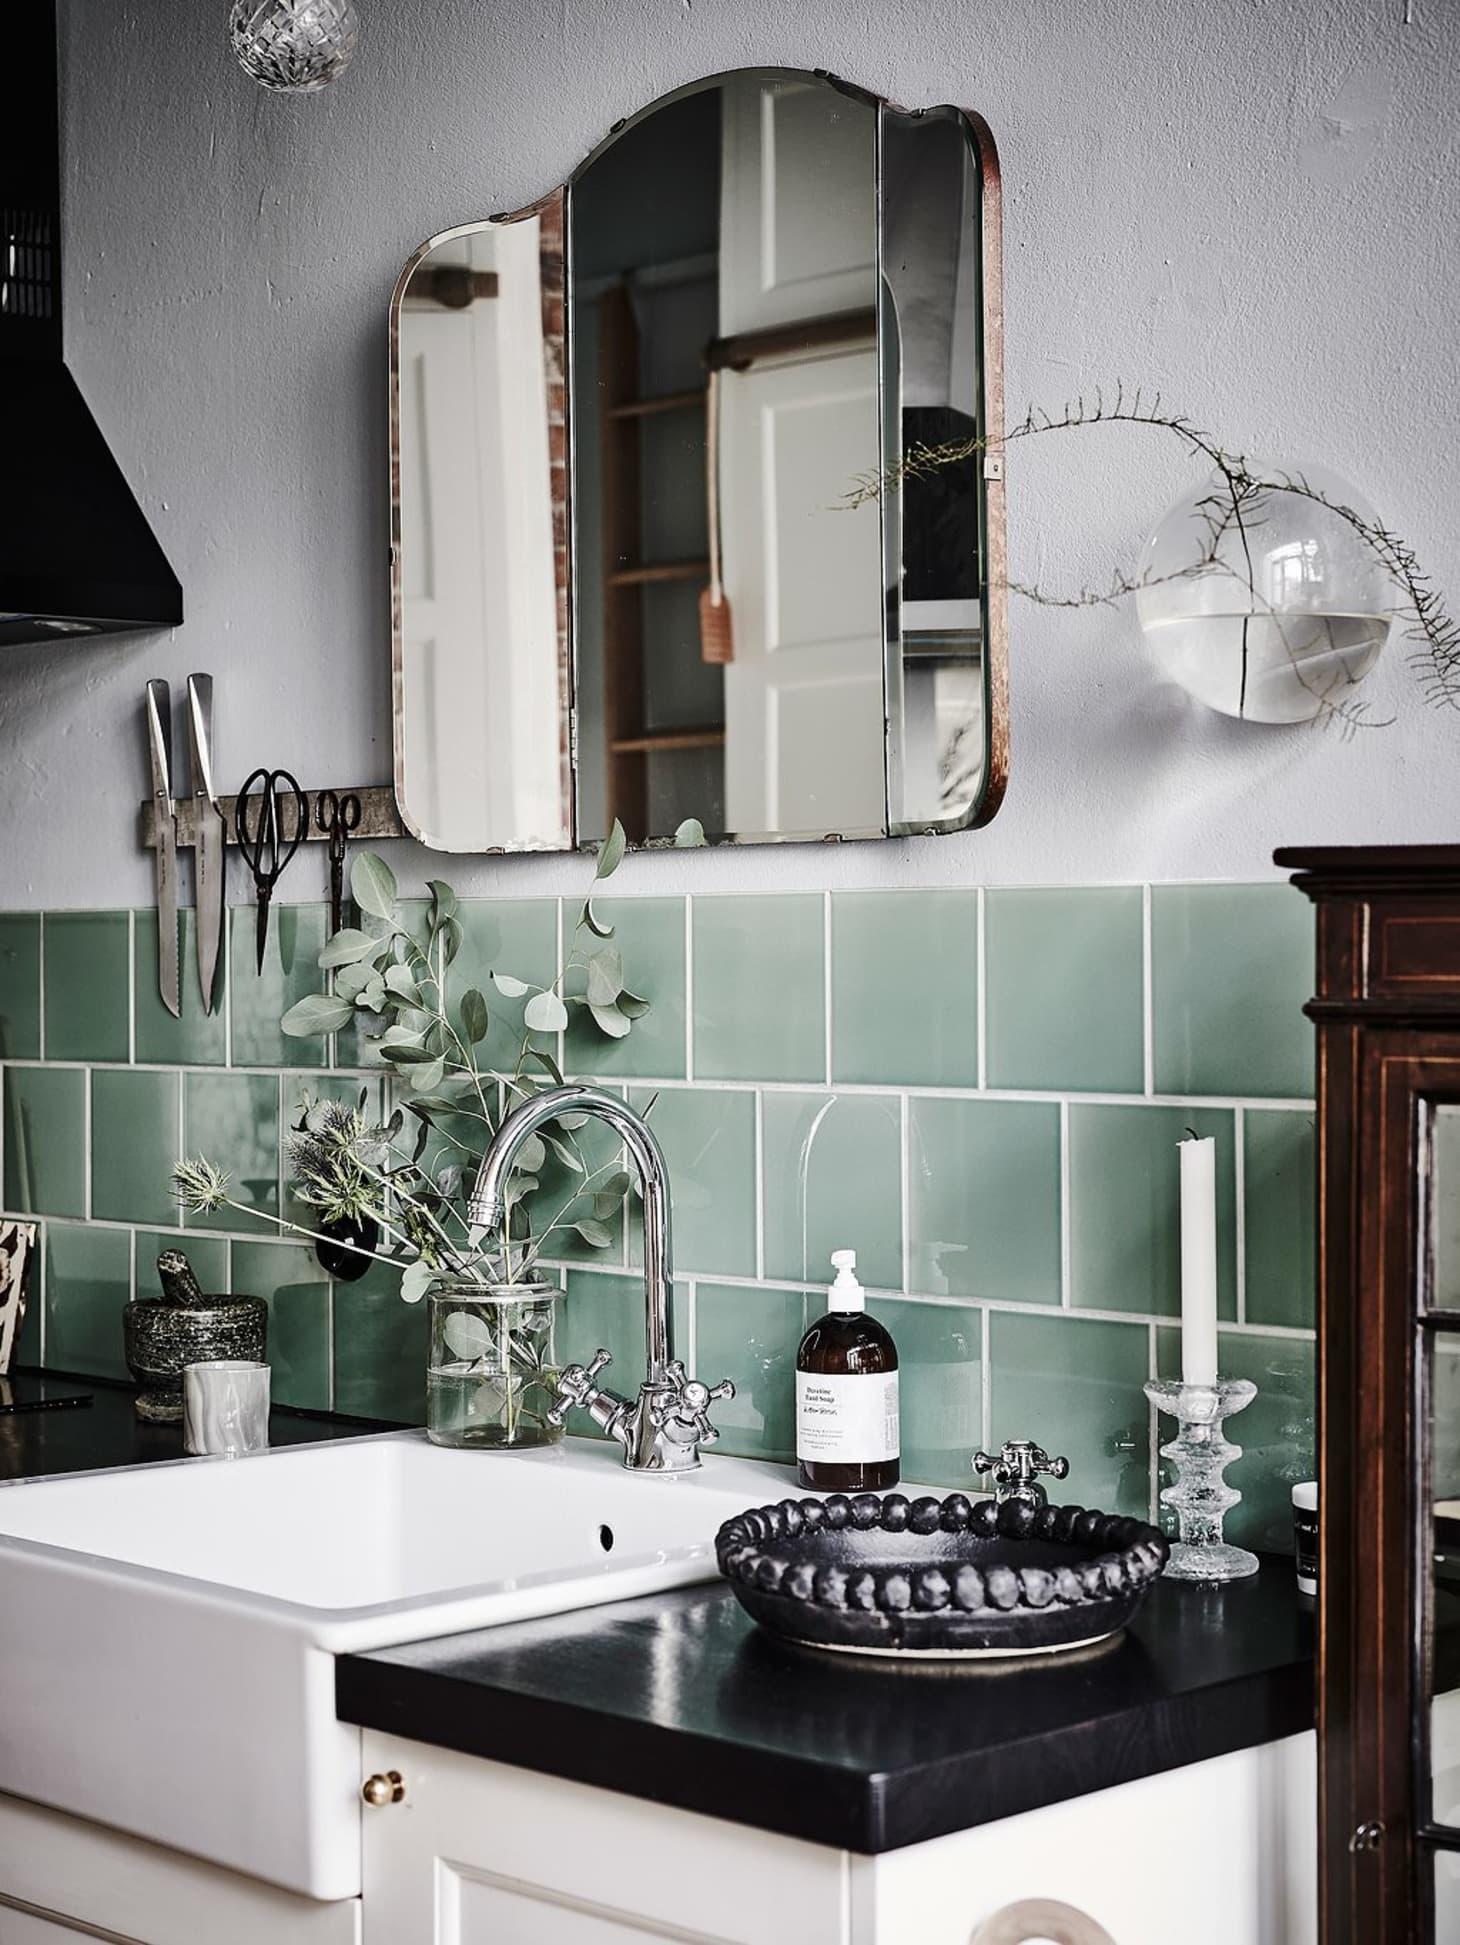 Inexpensive & Timeless Kitchen Backsplash Ideas ...